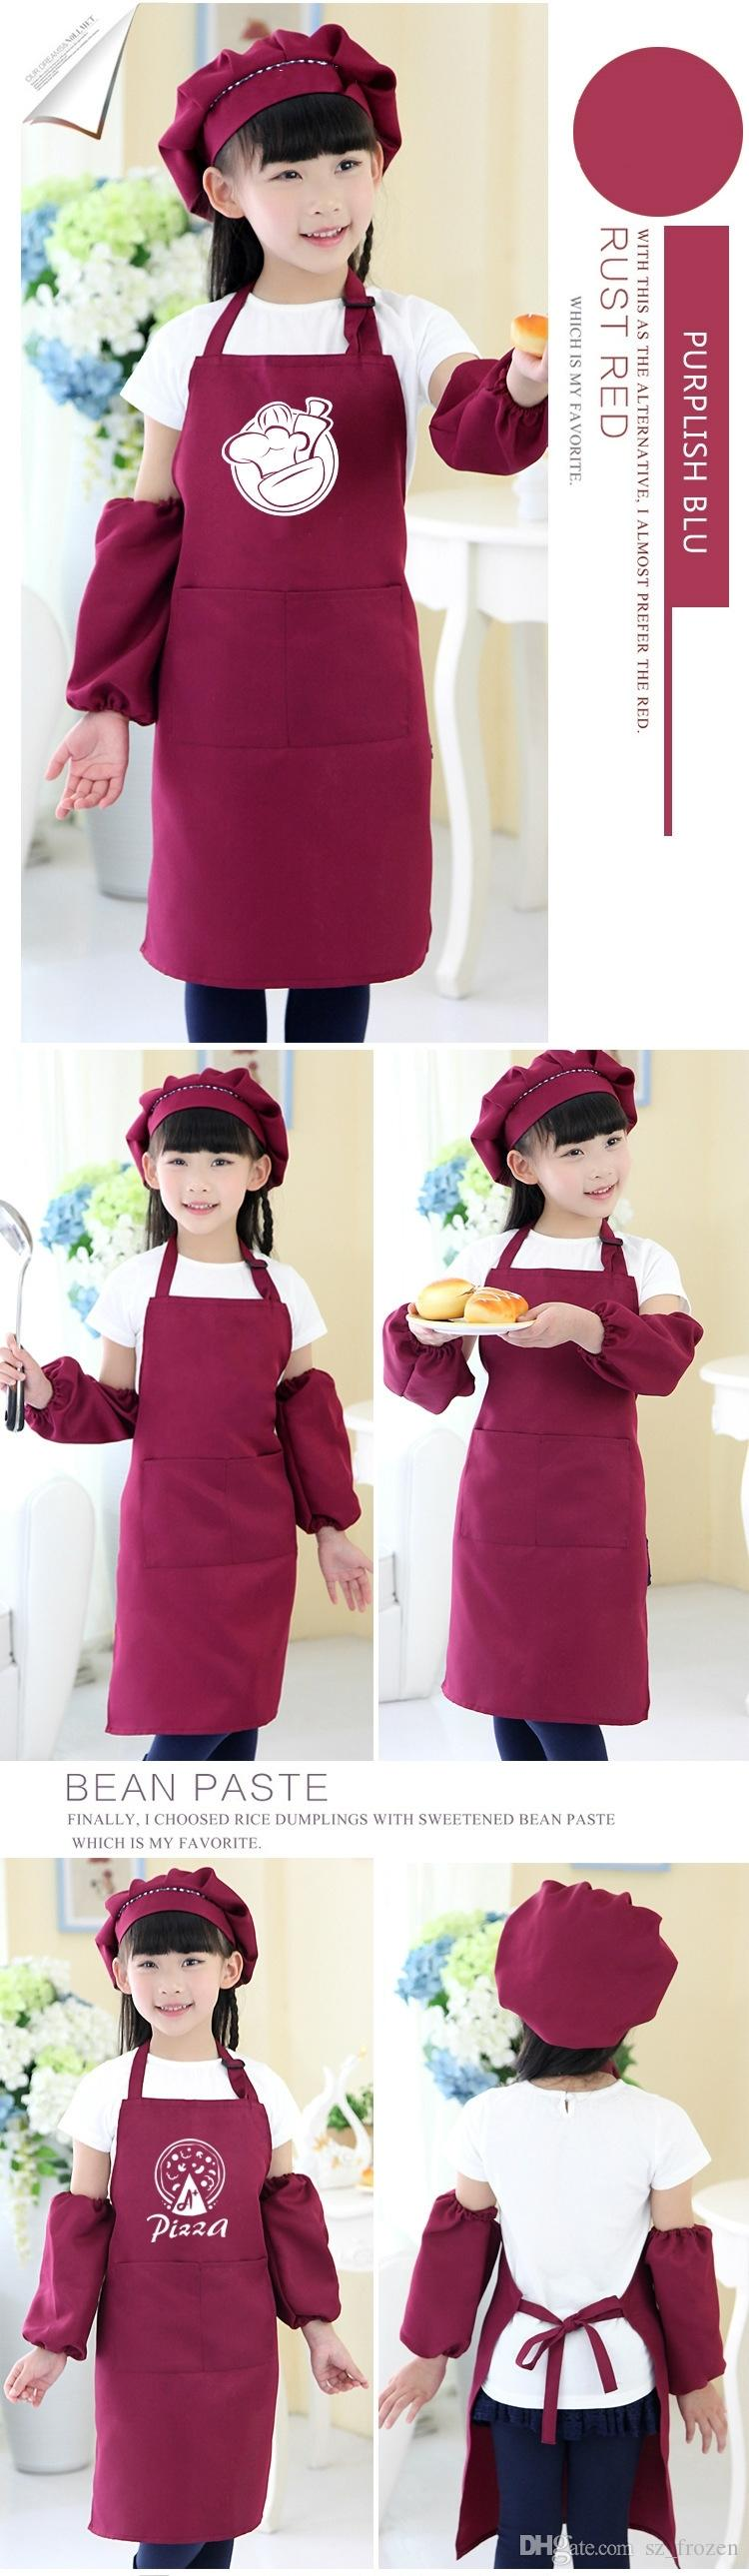 Kids Aprons Pocket Craft Cooking Baking Art Painting Kids Kitchen Dining Bib Children Aprons Kids Aprons A-0380